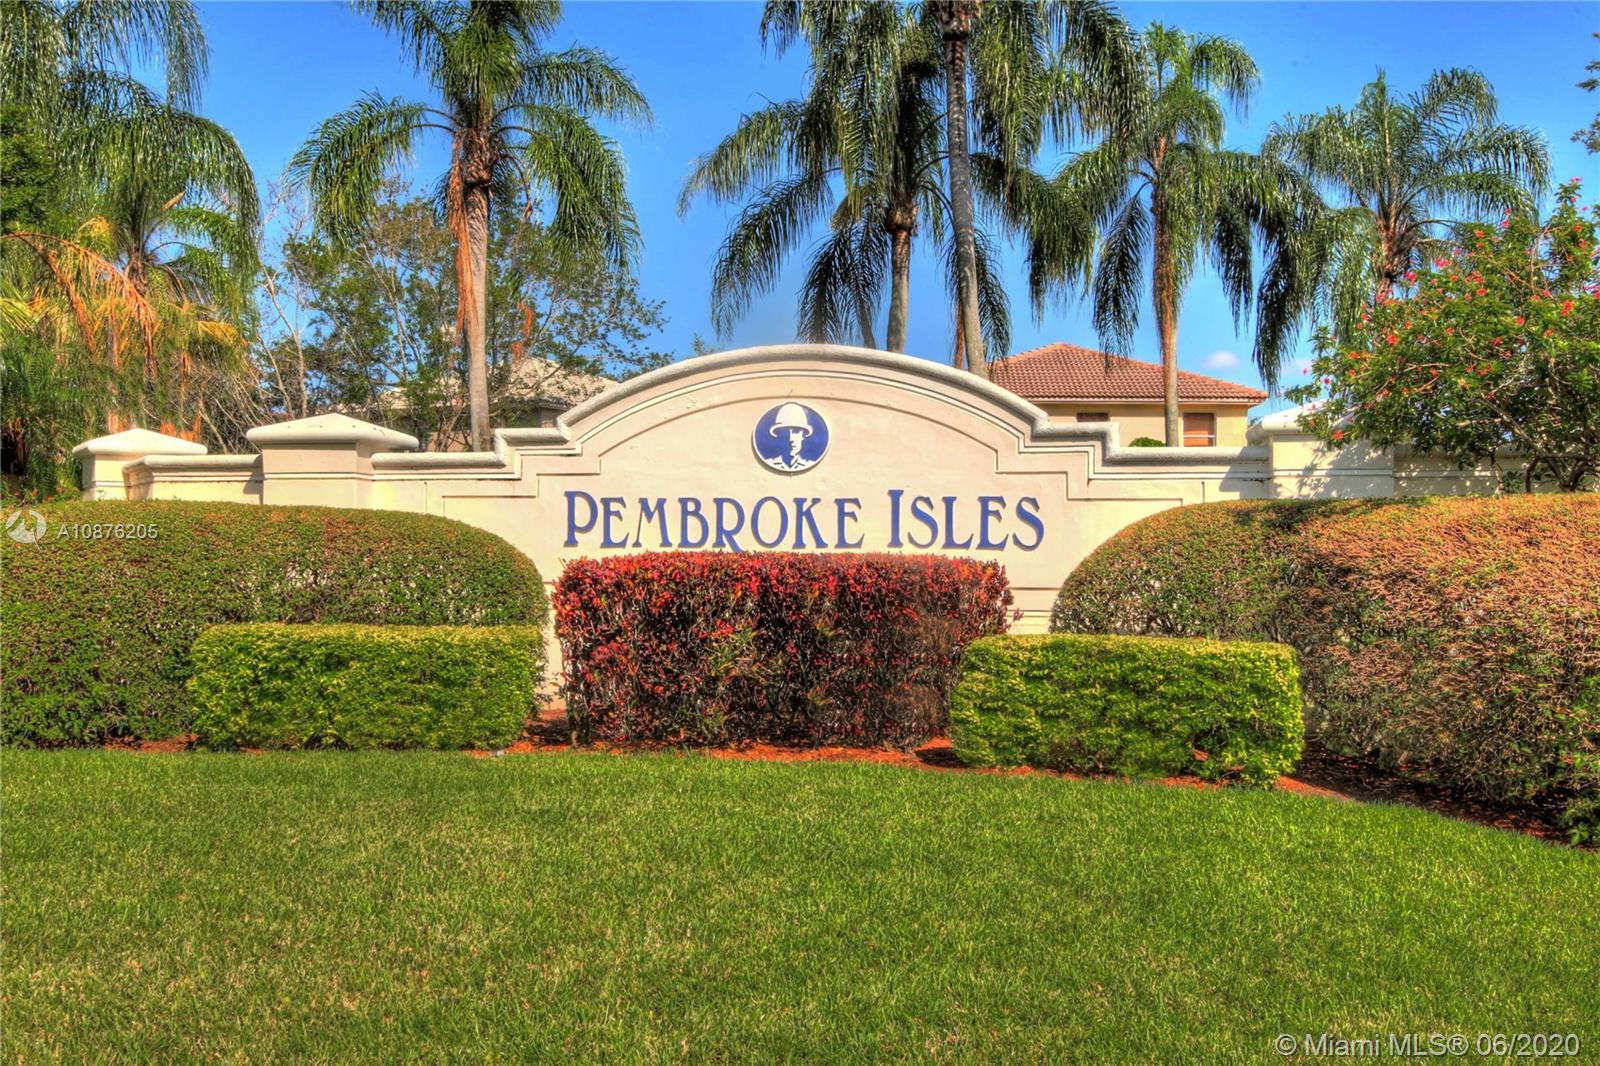 Pembroke Isles # - 29 - photo